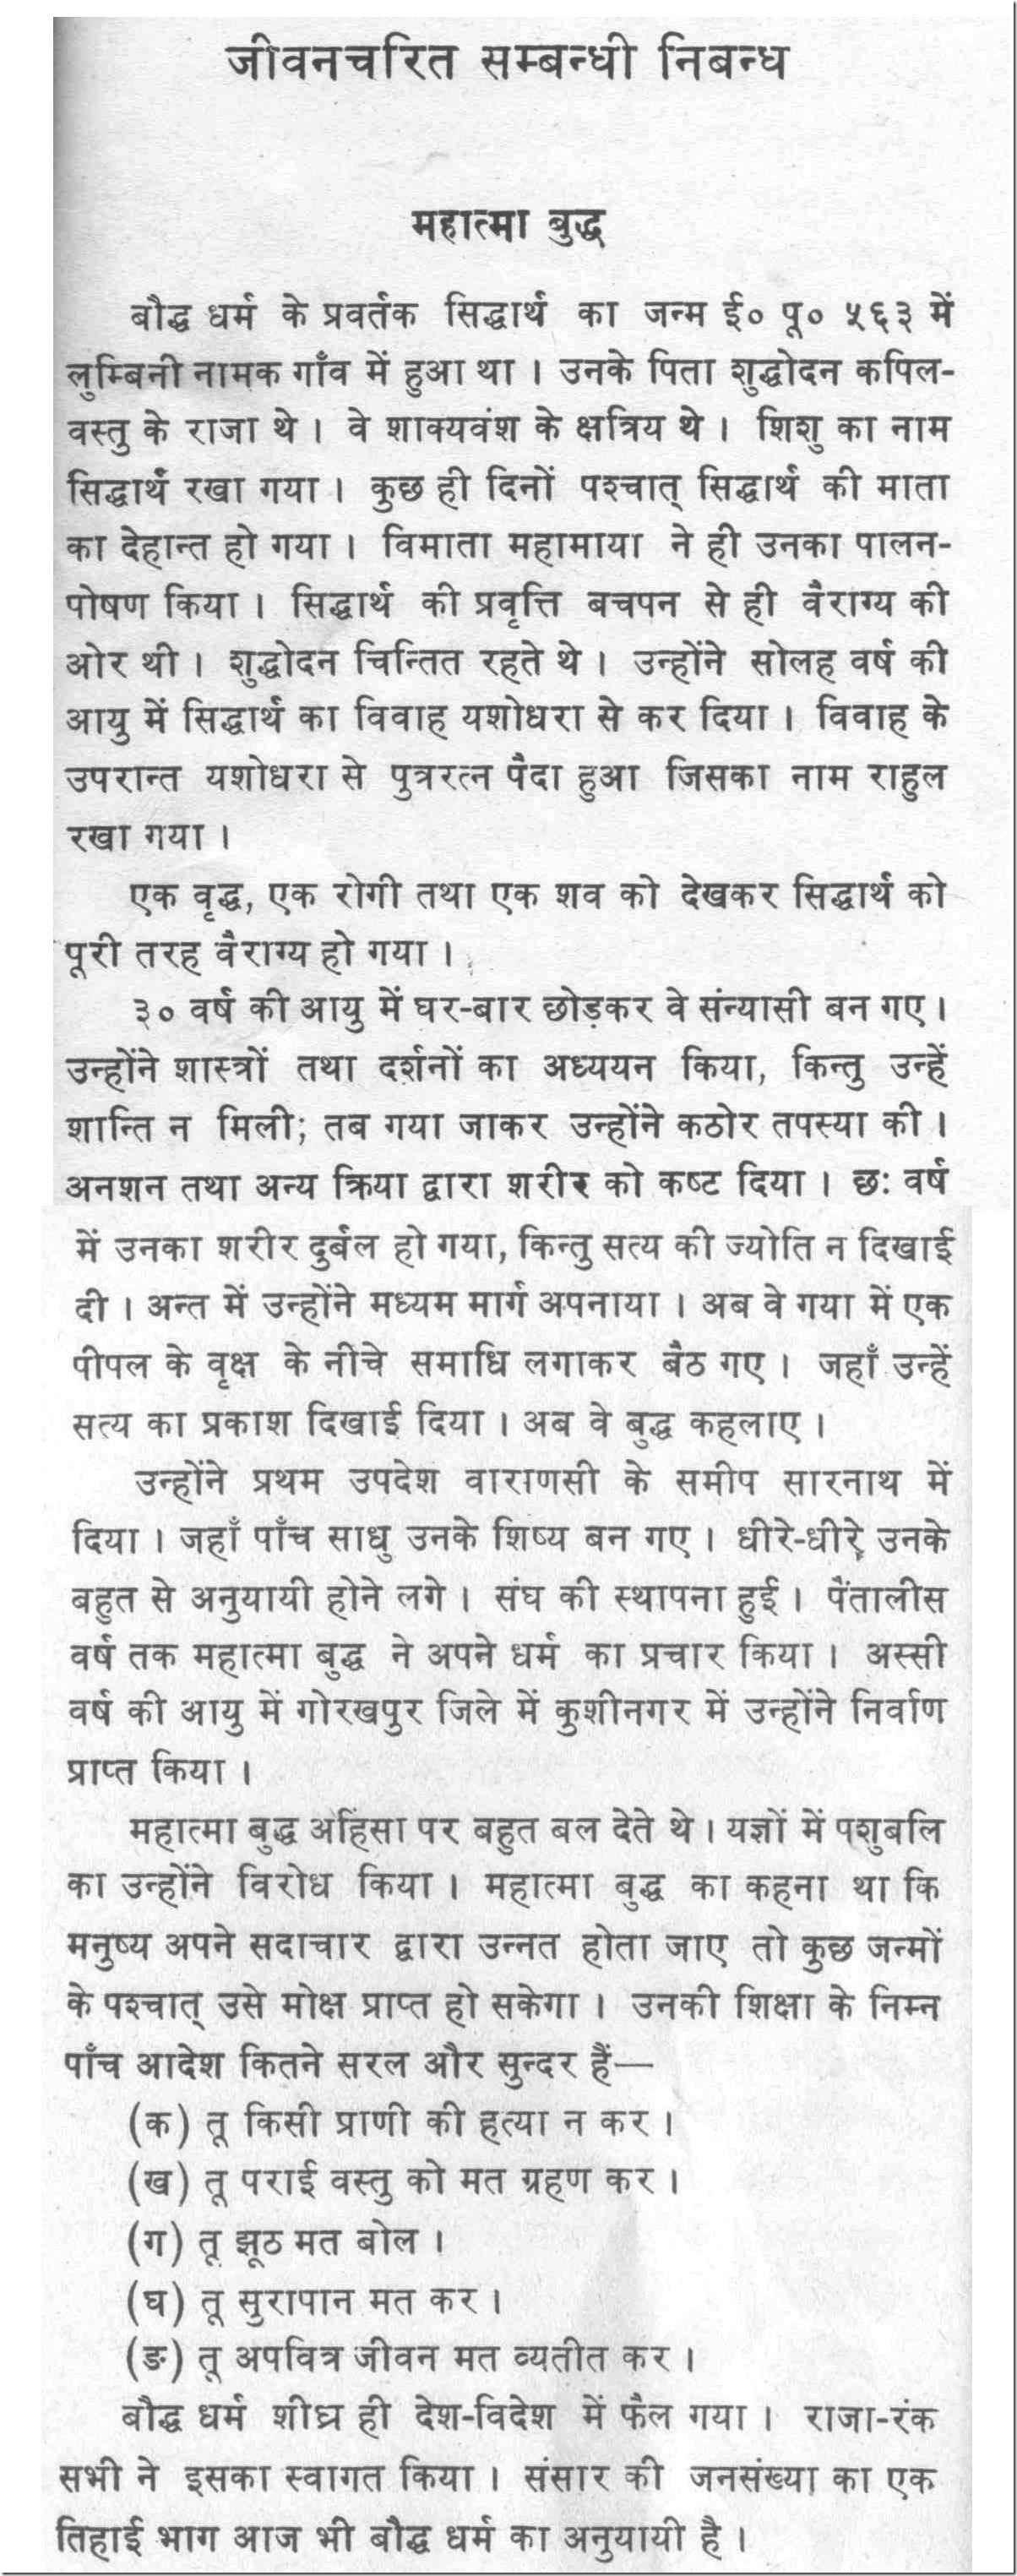 009 Essay Example Mahatma Gandhi In Urdu Hindi L Imposing Language Jayanti Speech Full